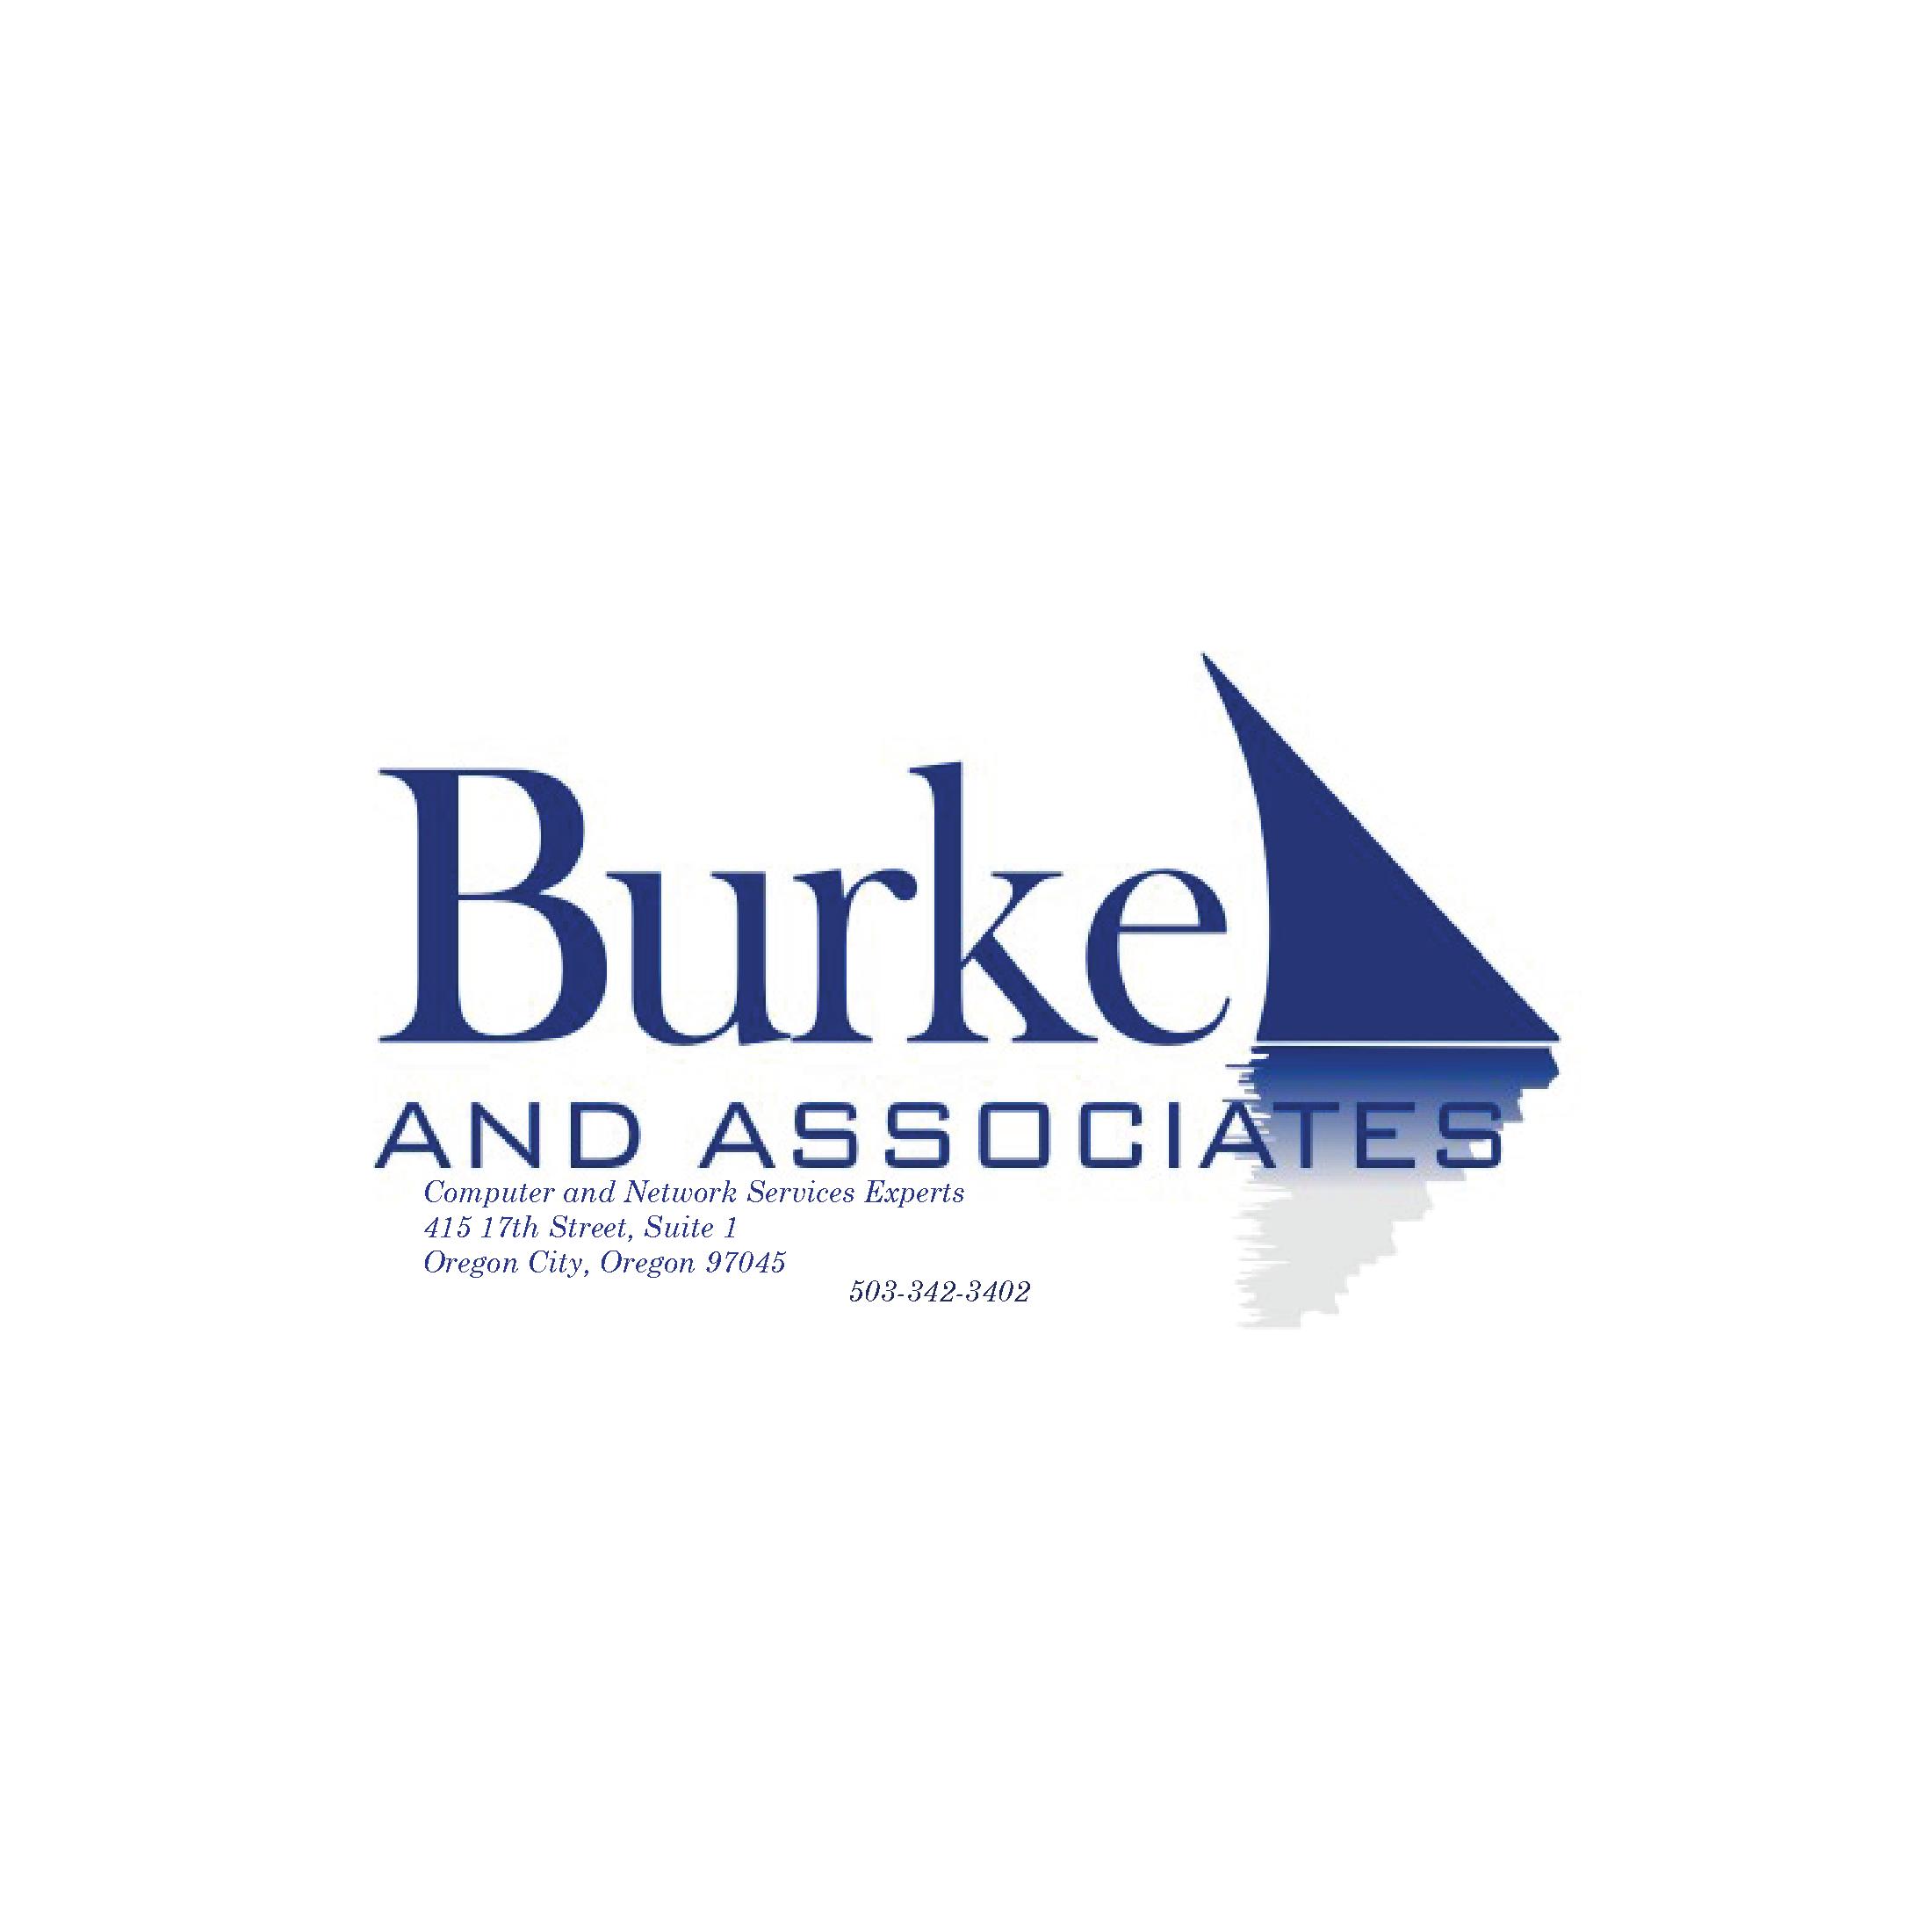 Burke & Associates